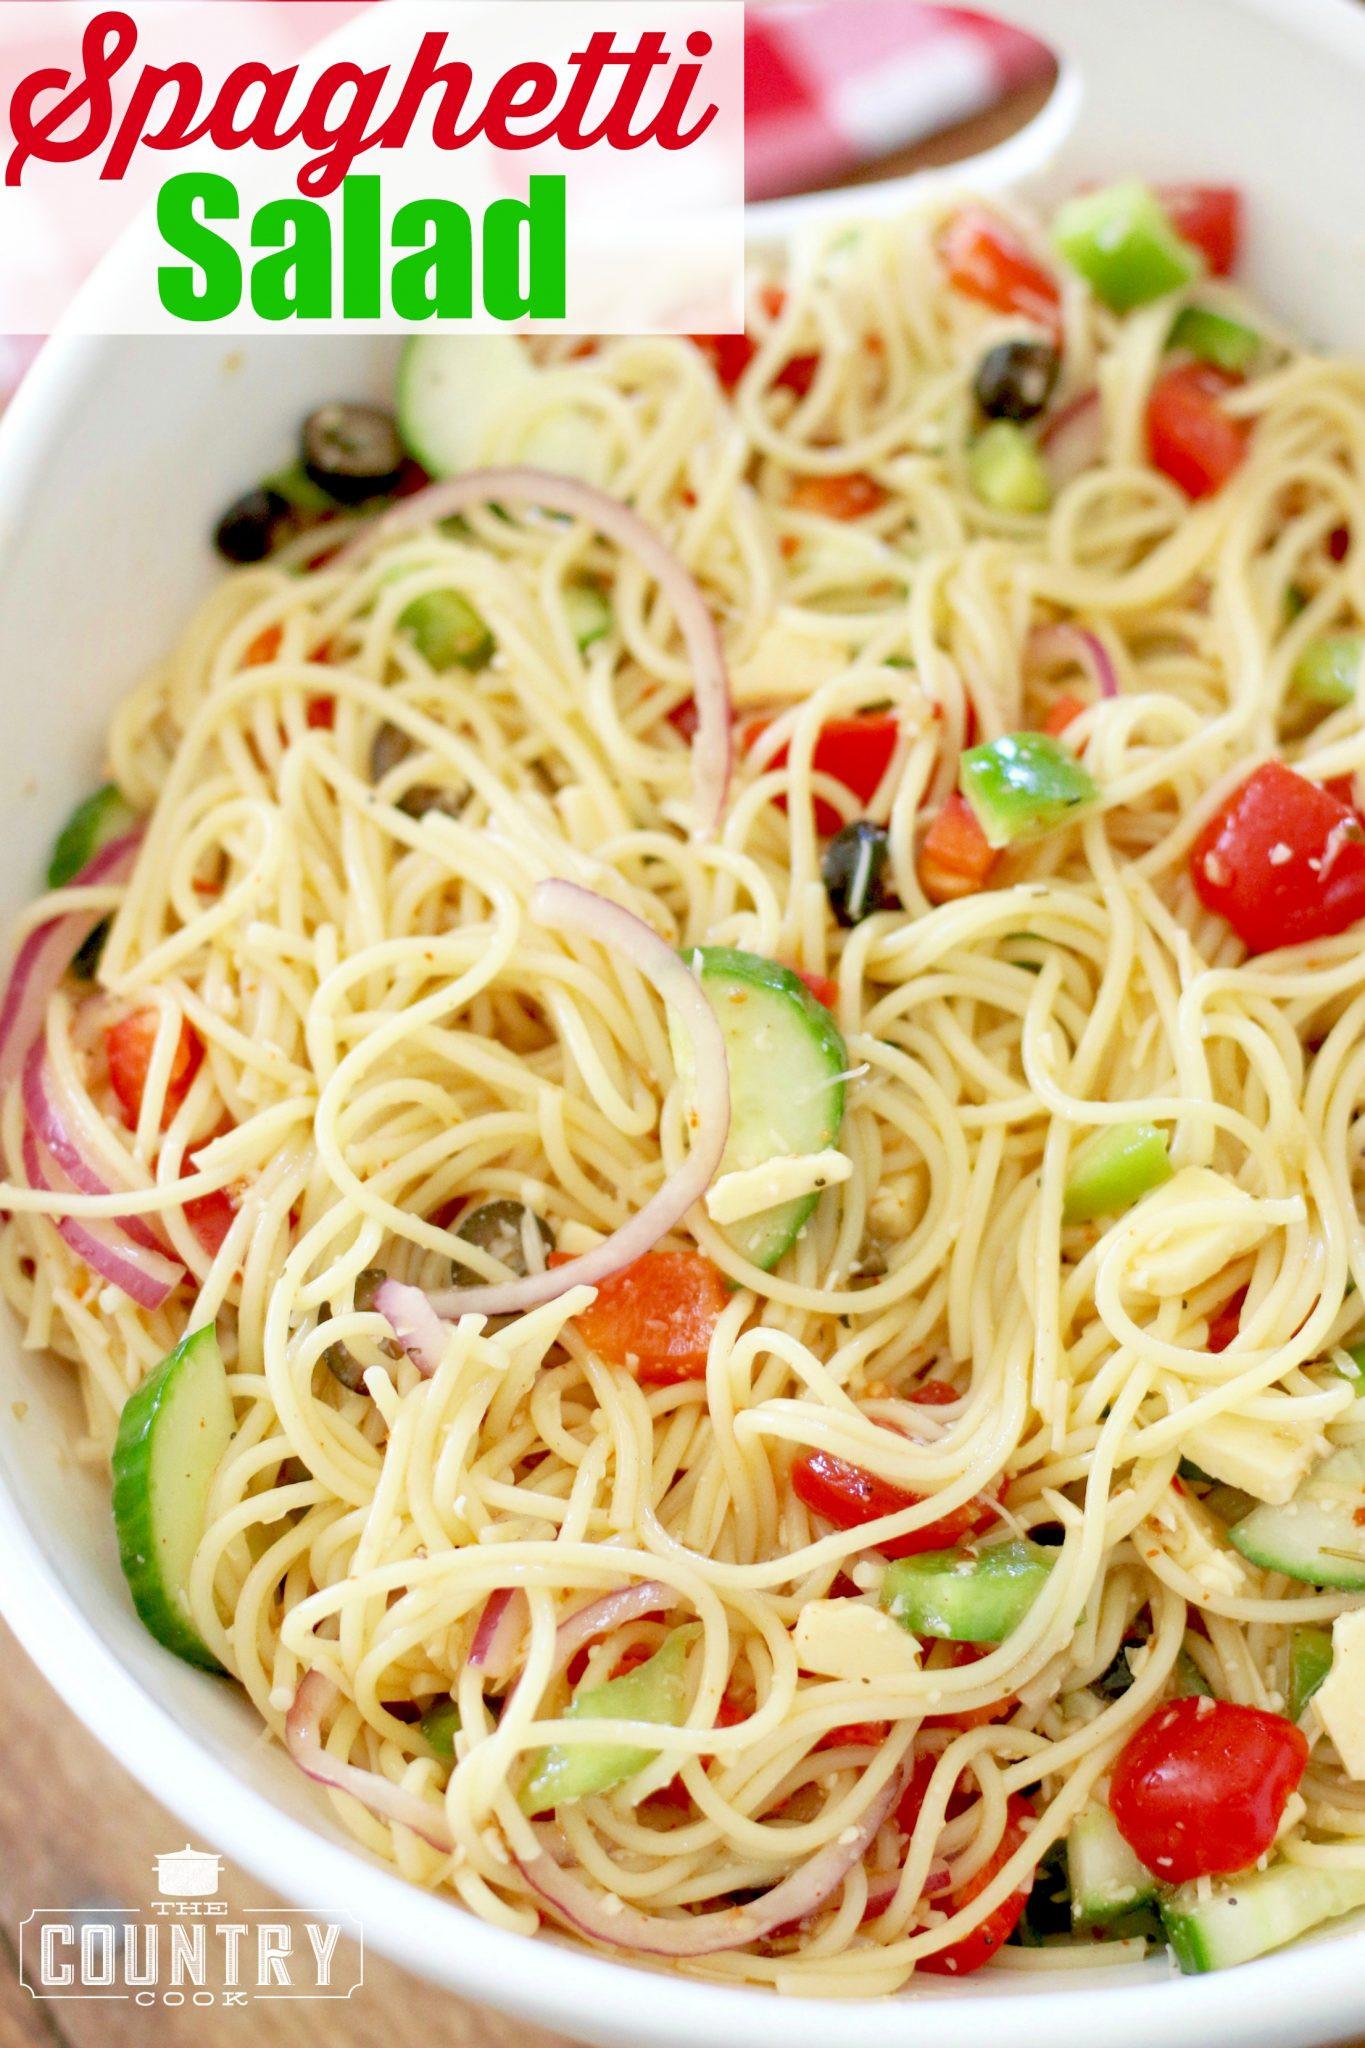 Spaghetti Salad Recipe  Spaghetti Salad The Country Cook